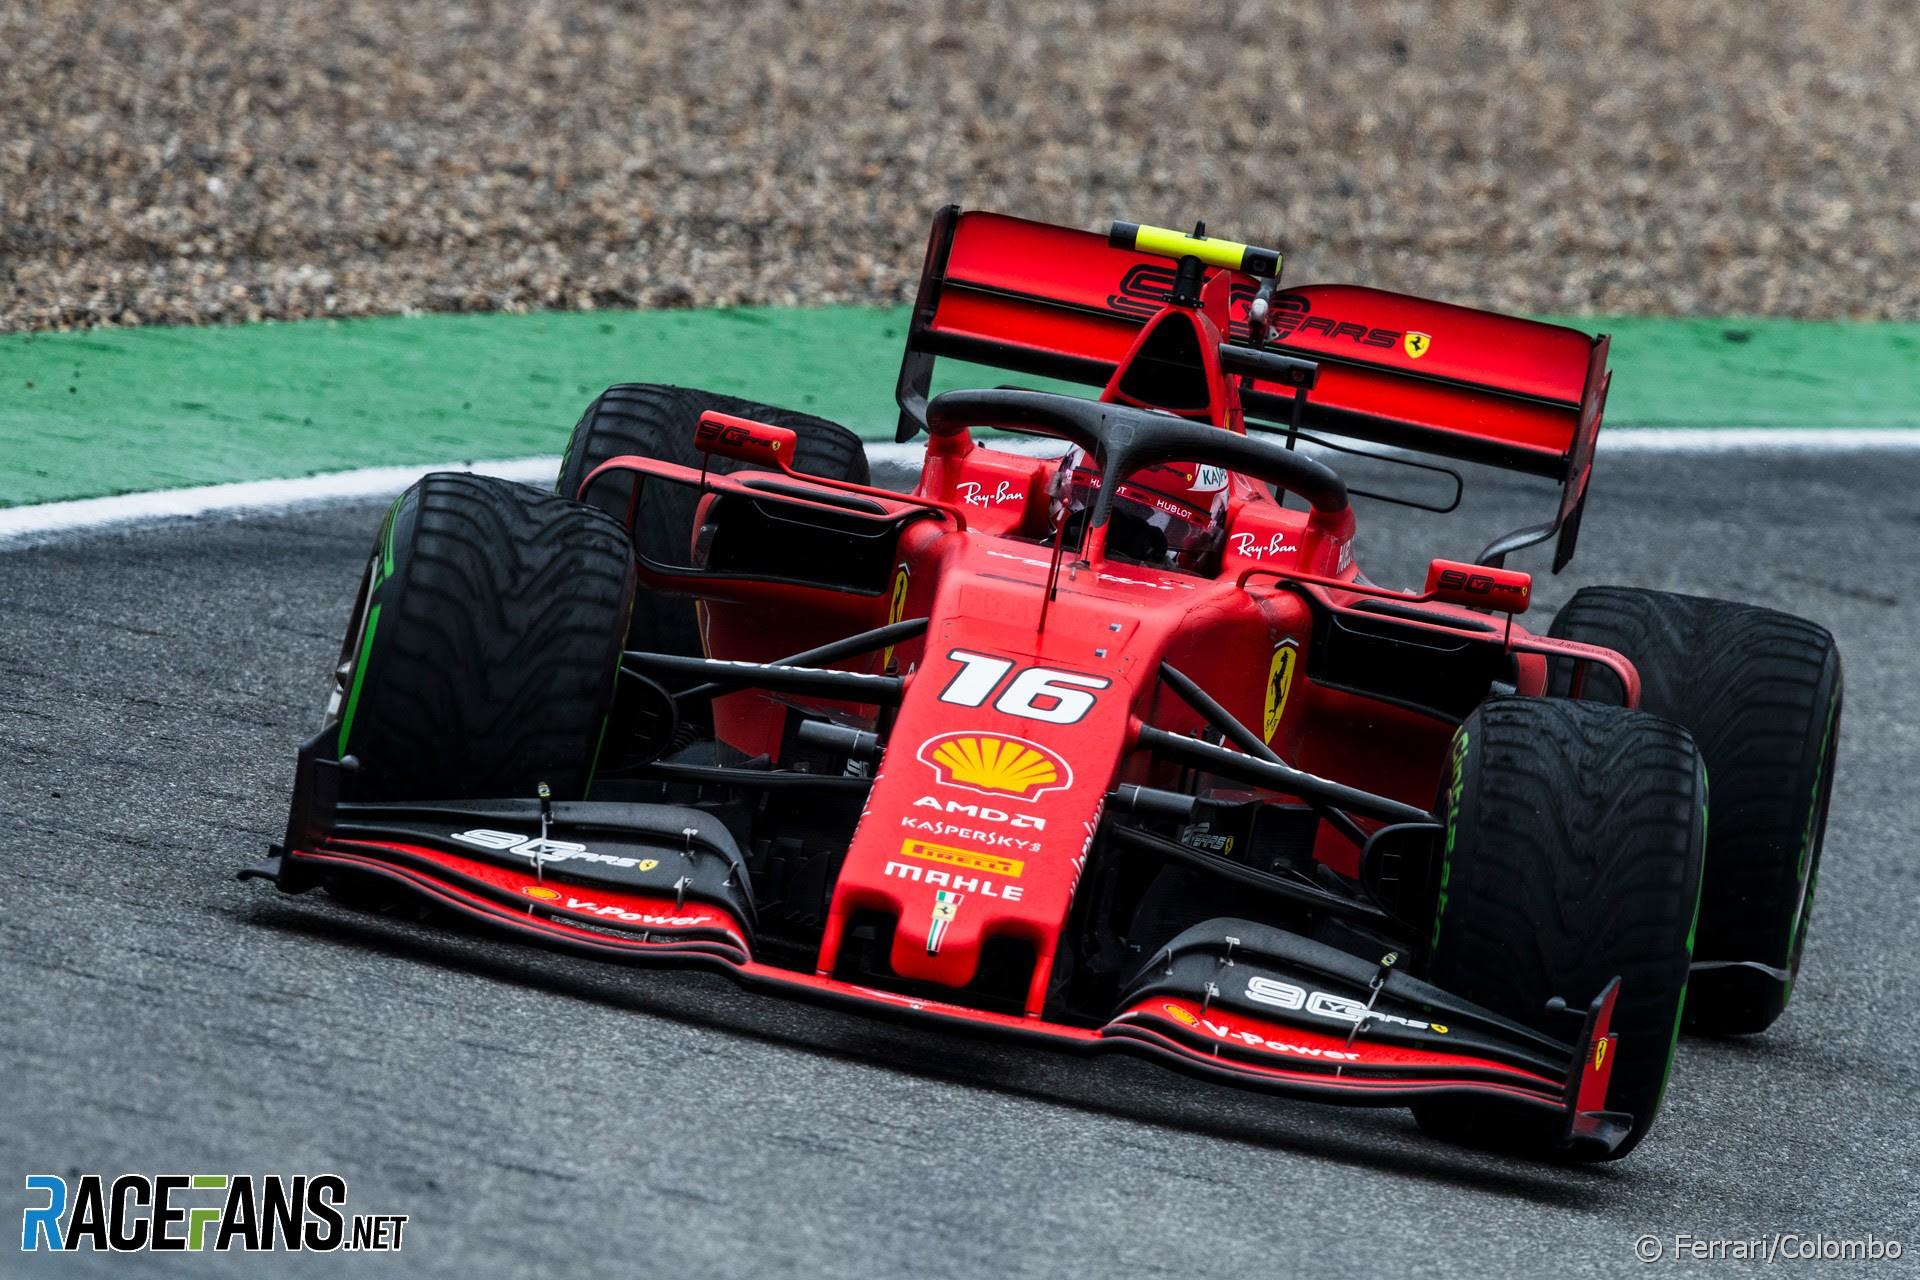 Charles Leclerc, Ferrari, Hockenheimring, 2019